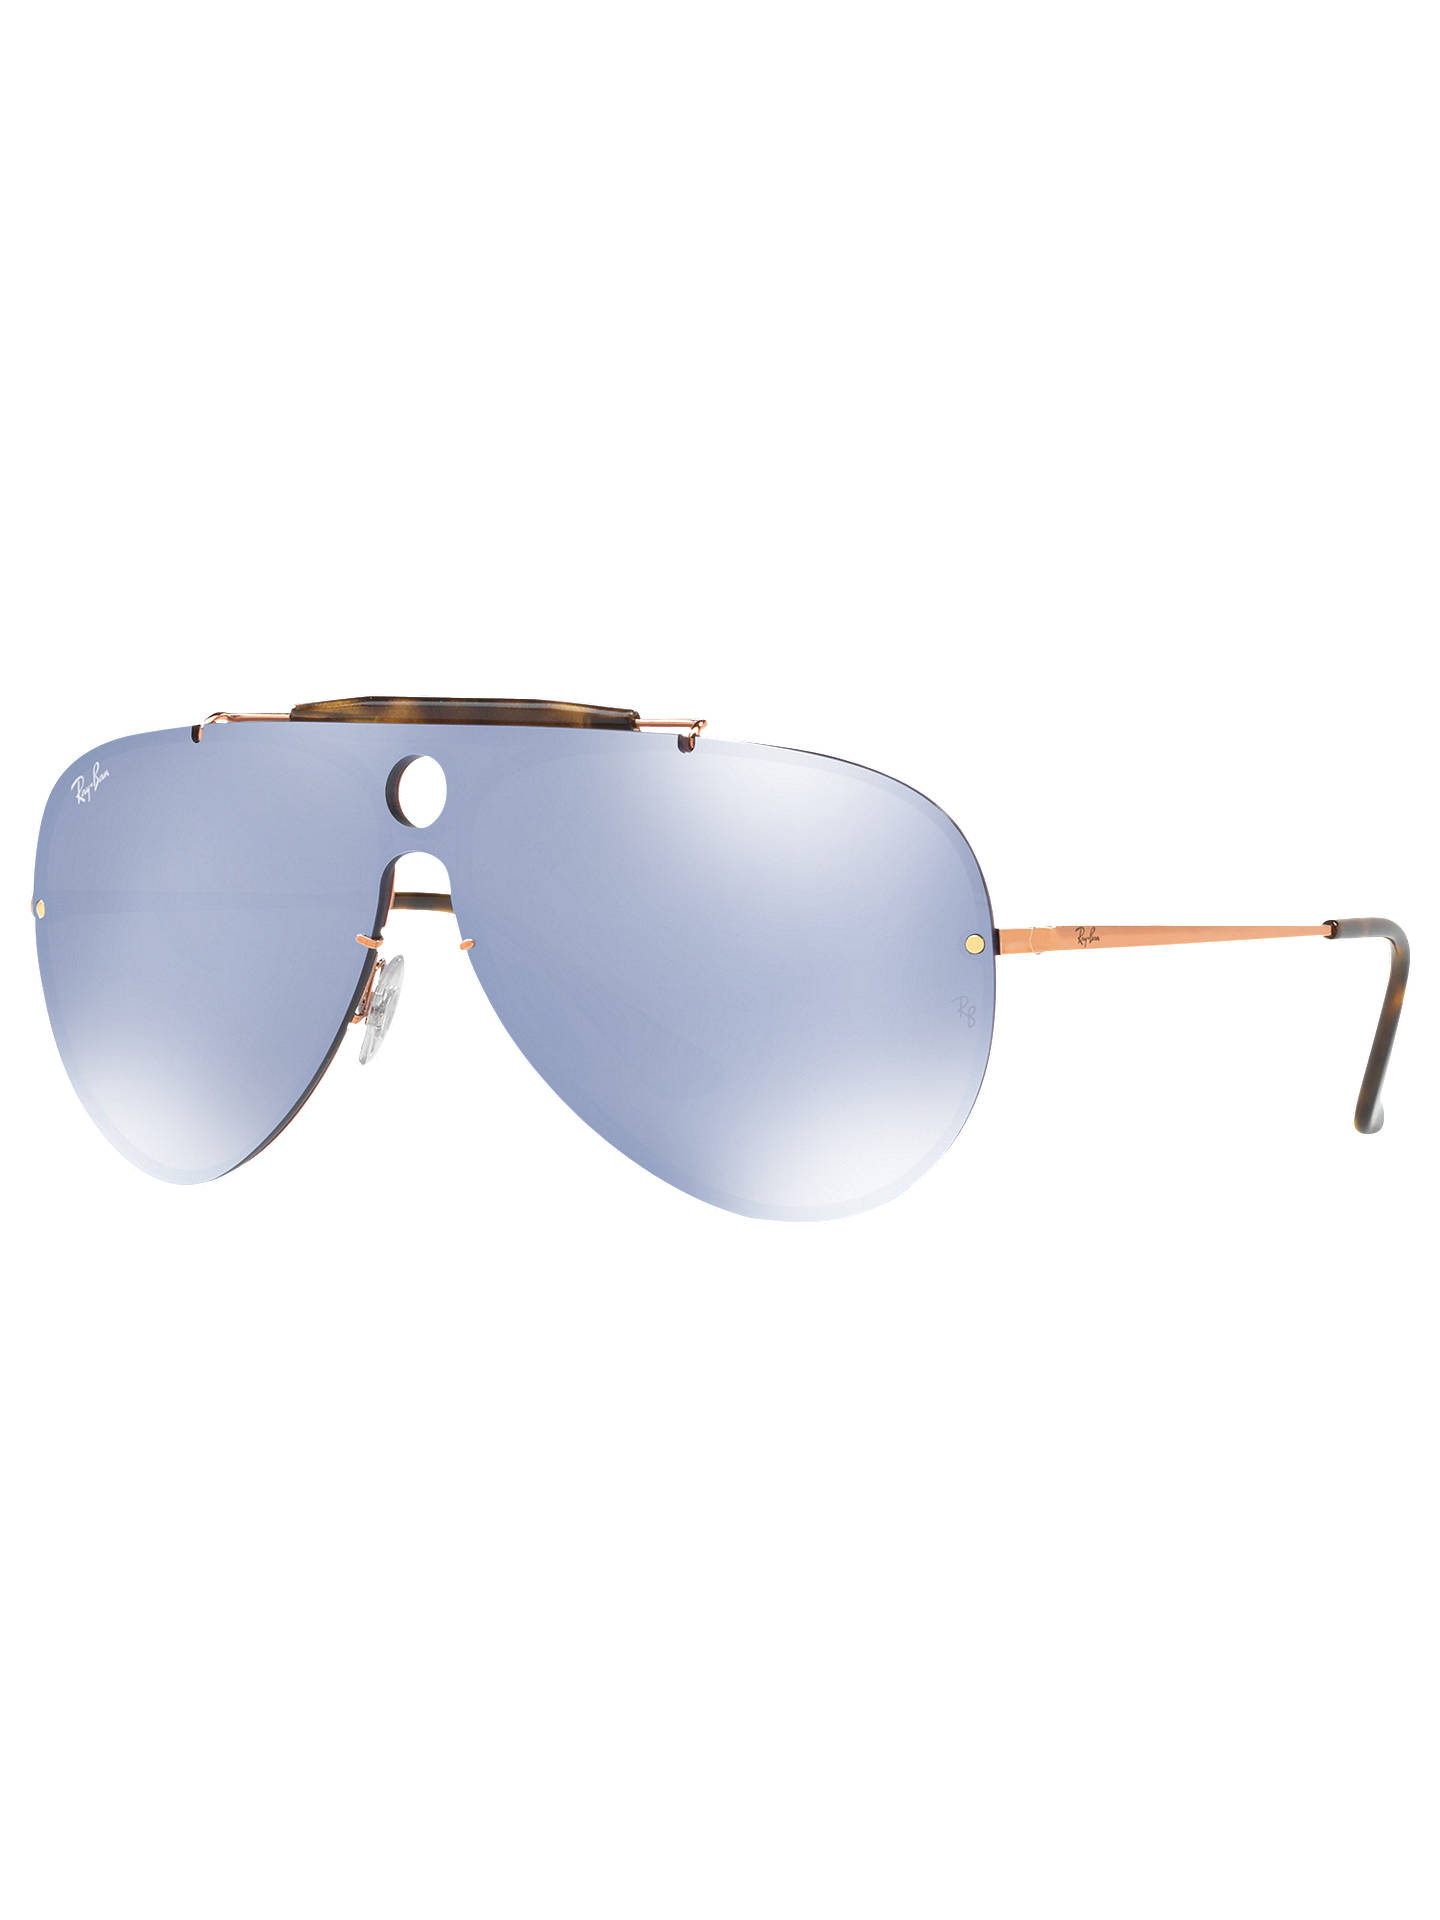 6ae606b0eab Ray-Ban RB3581N Blaze Shooter Aviator Sunglasses at John Lewis ...